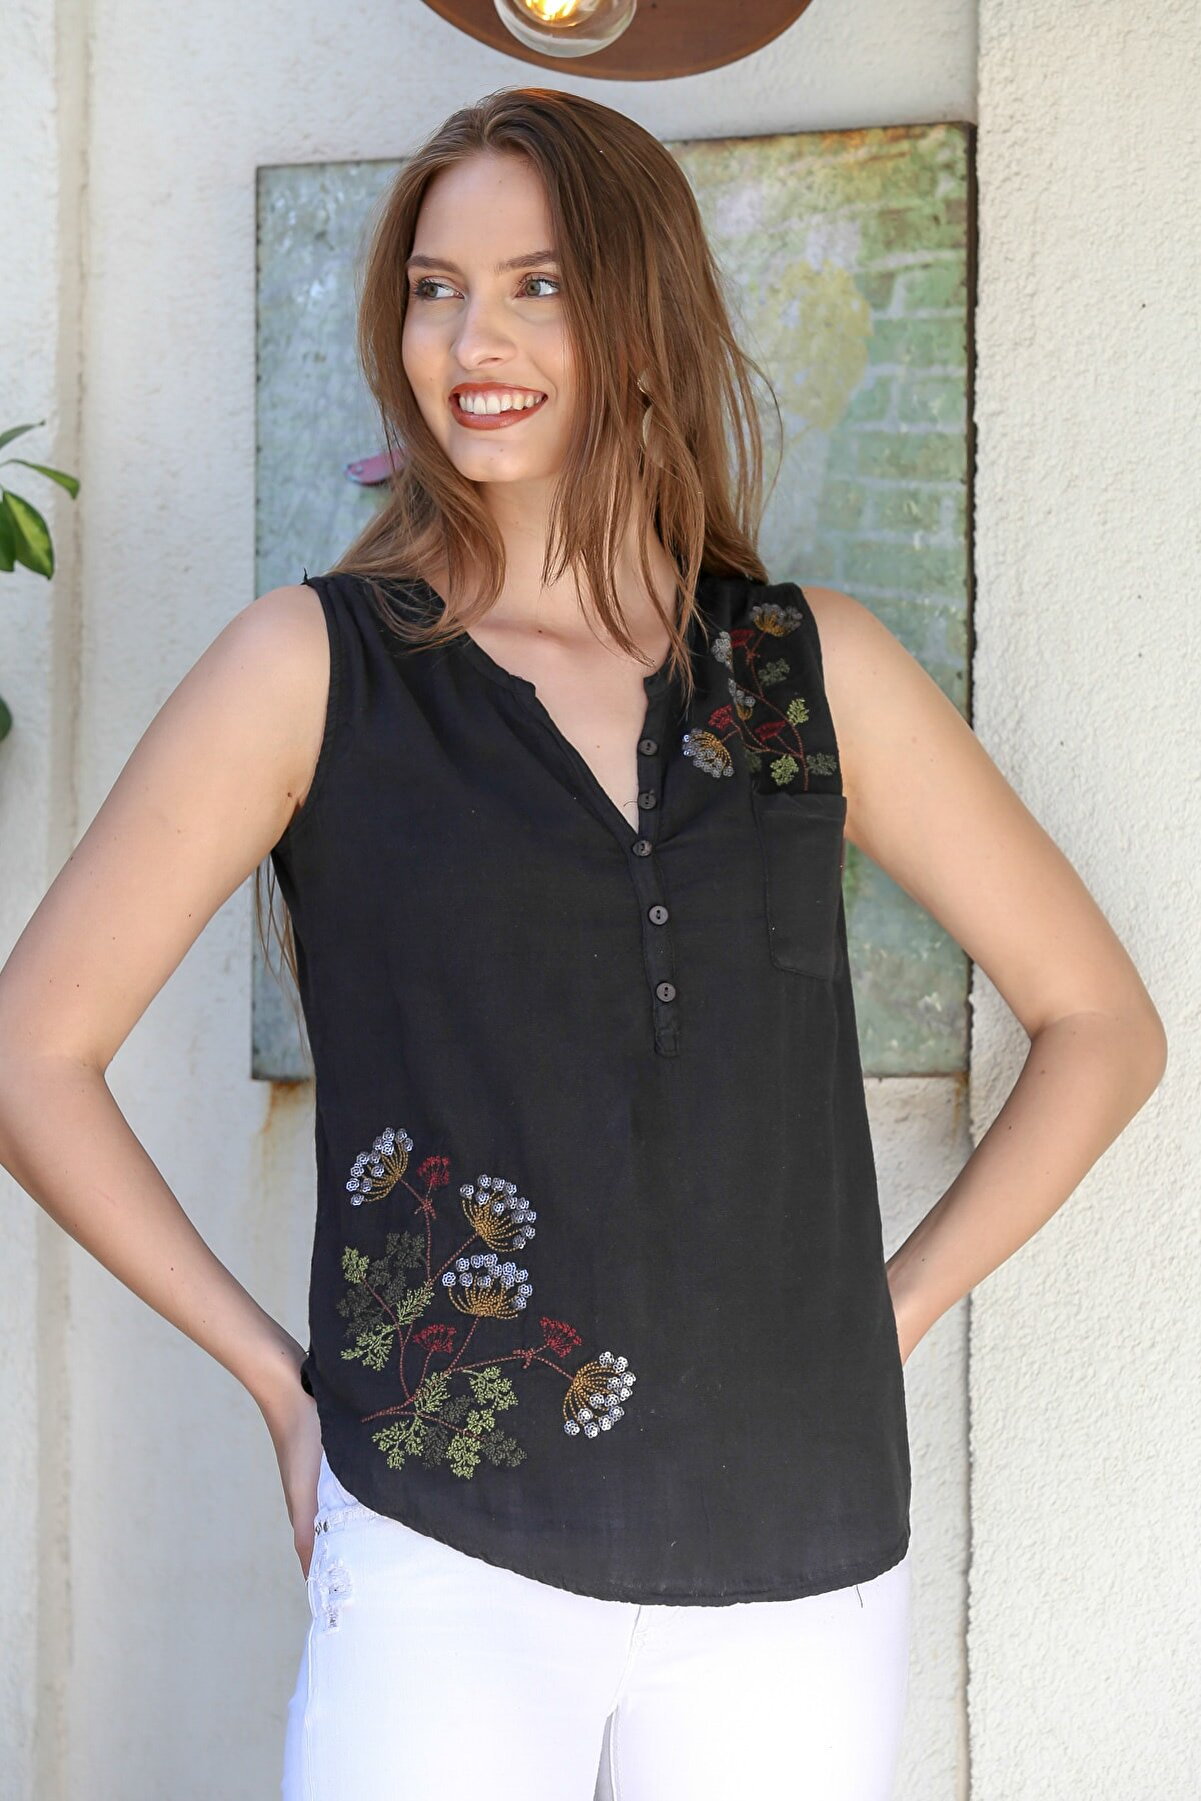 Chiccy Kadın Siyah Patı Düğme Detaylı Çiçek Nakışlı Kolsuz Dokuma Bluz M10010200BL95295